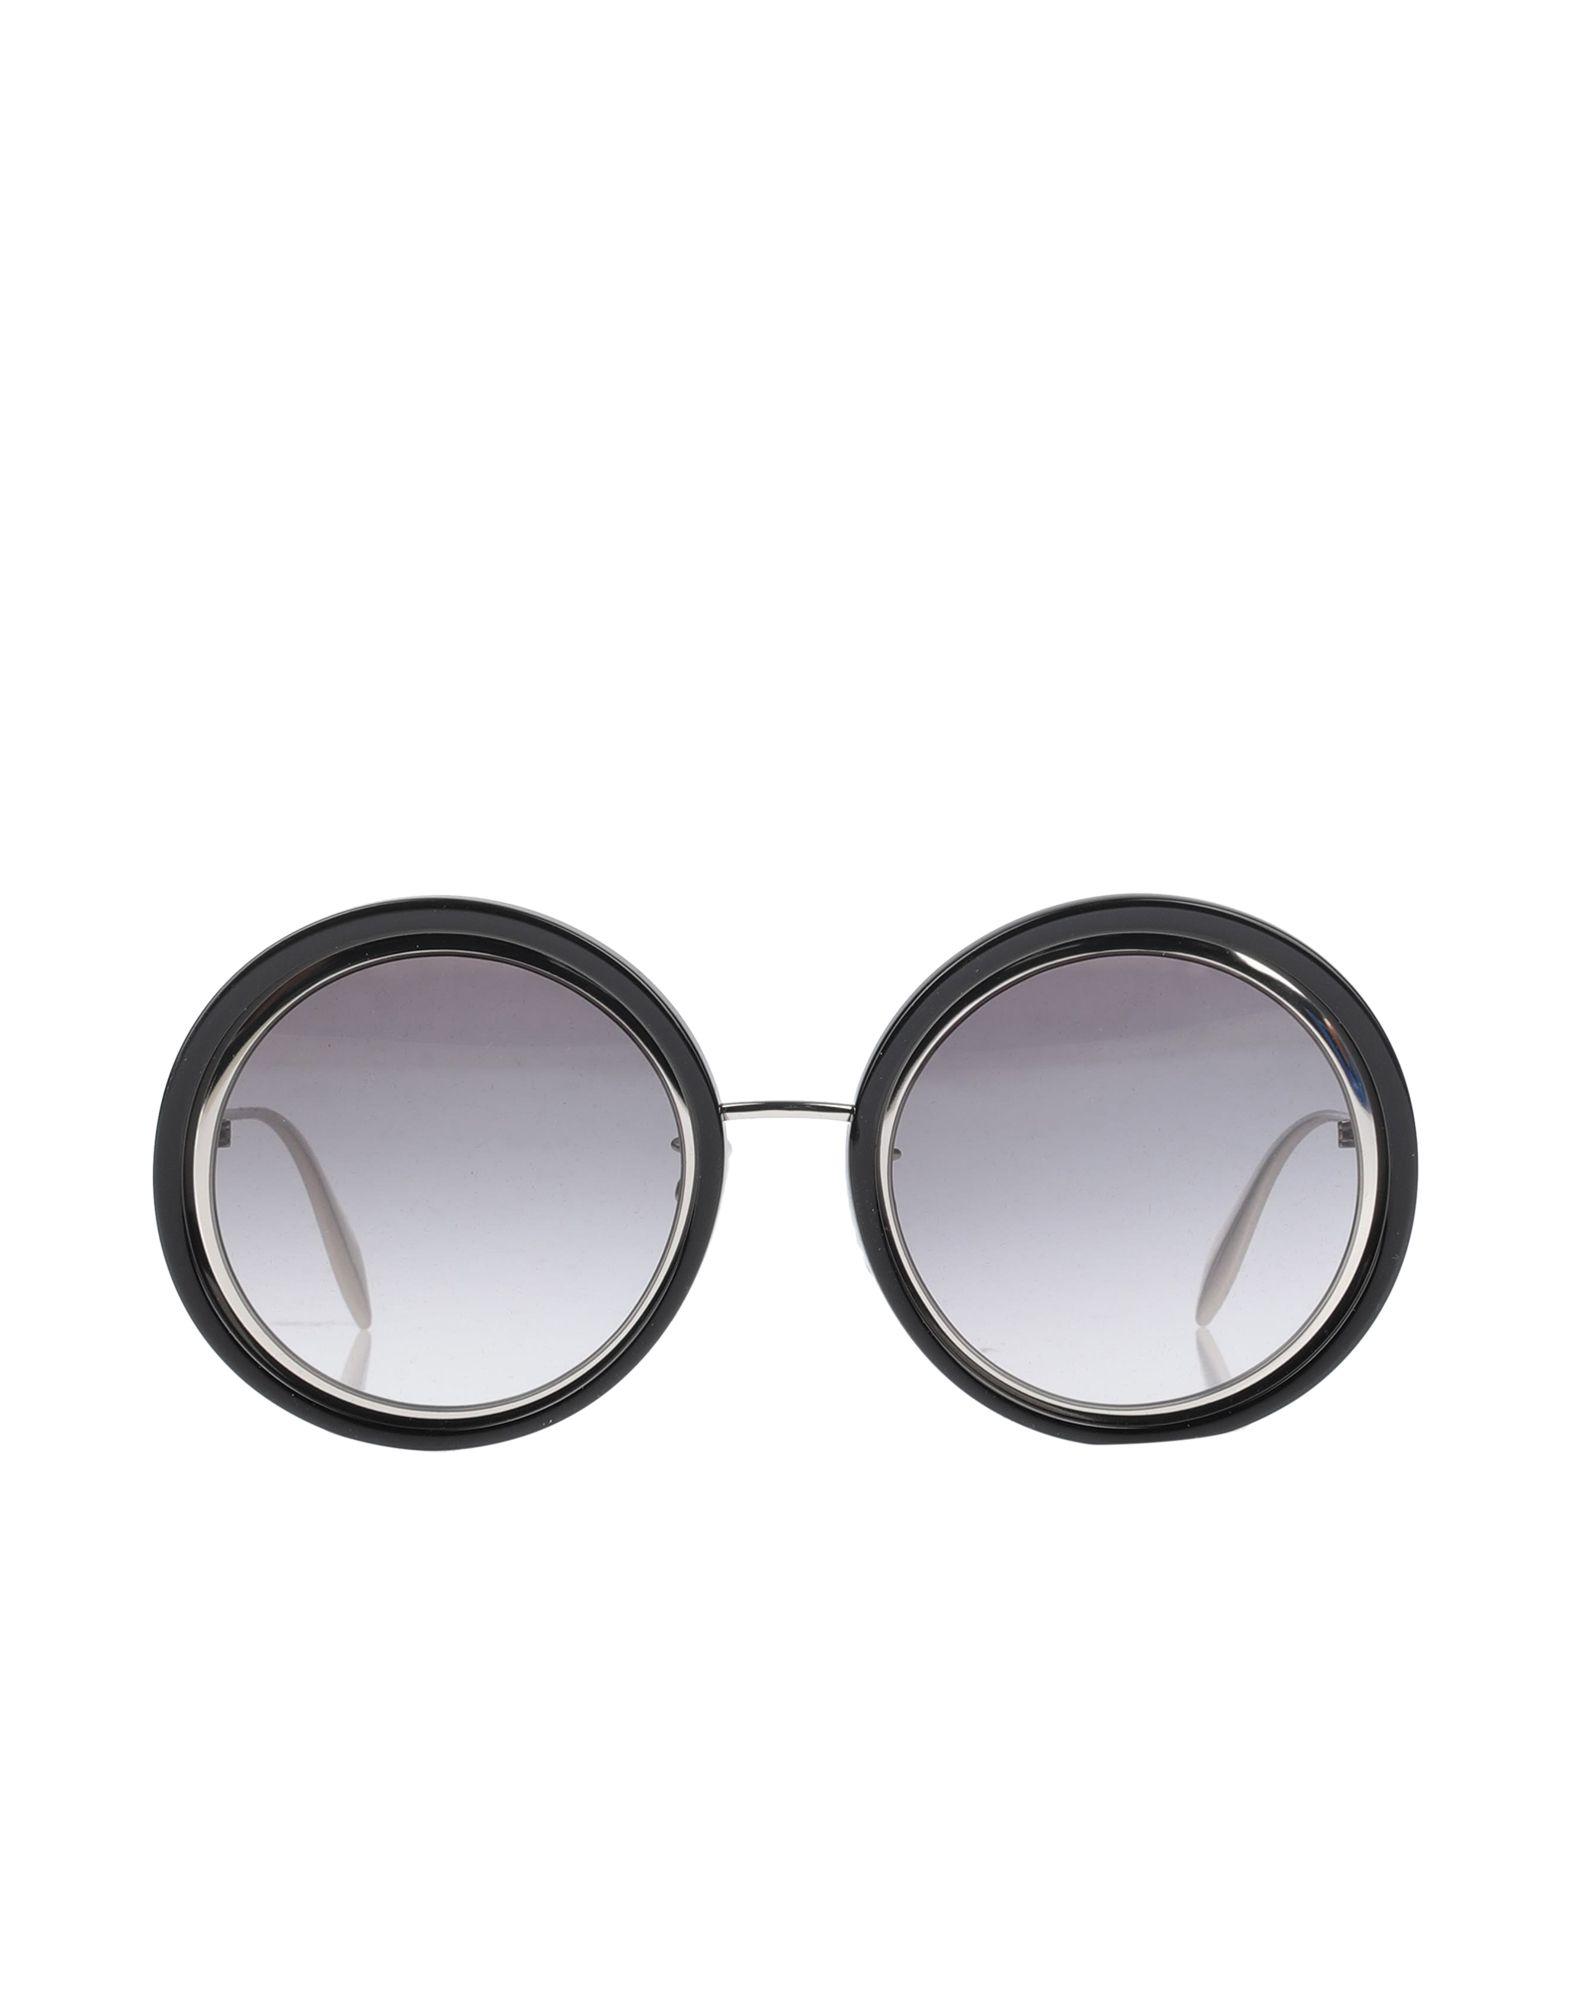 ALEXANDER MCQUEEN Sunglasses - Item 46721518